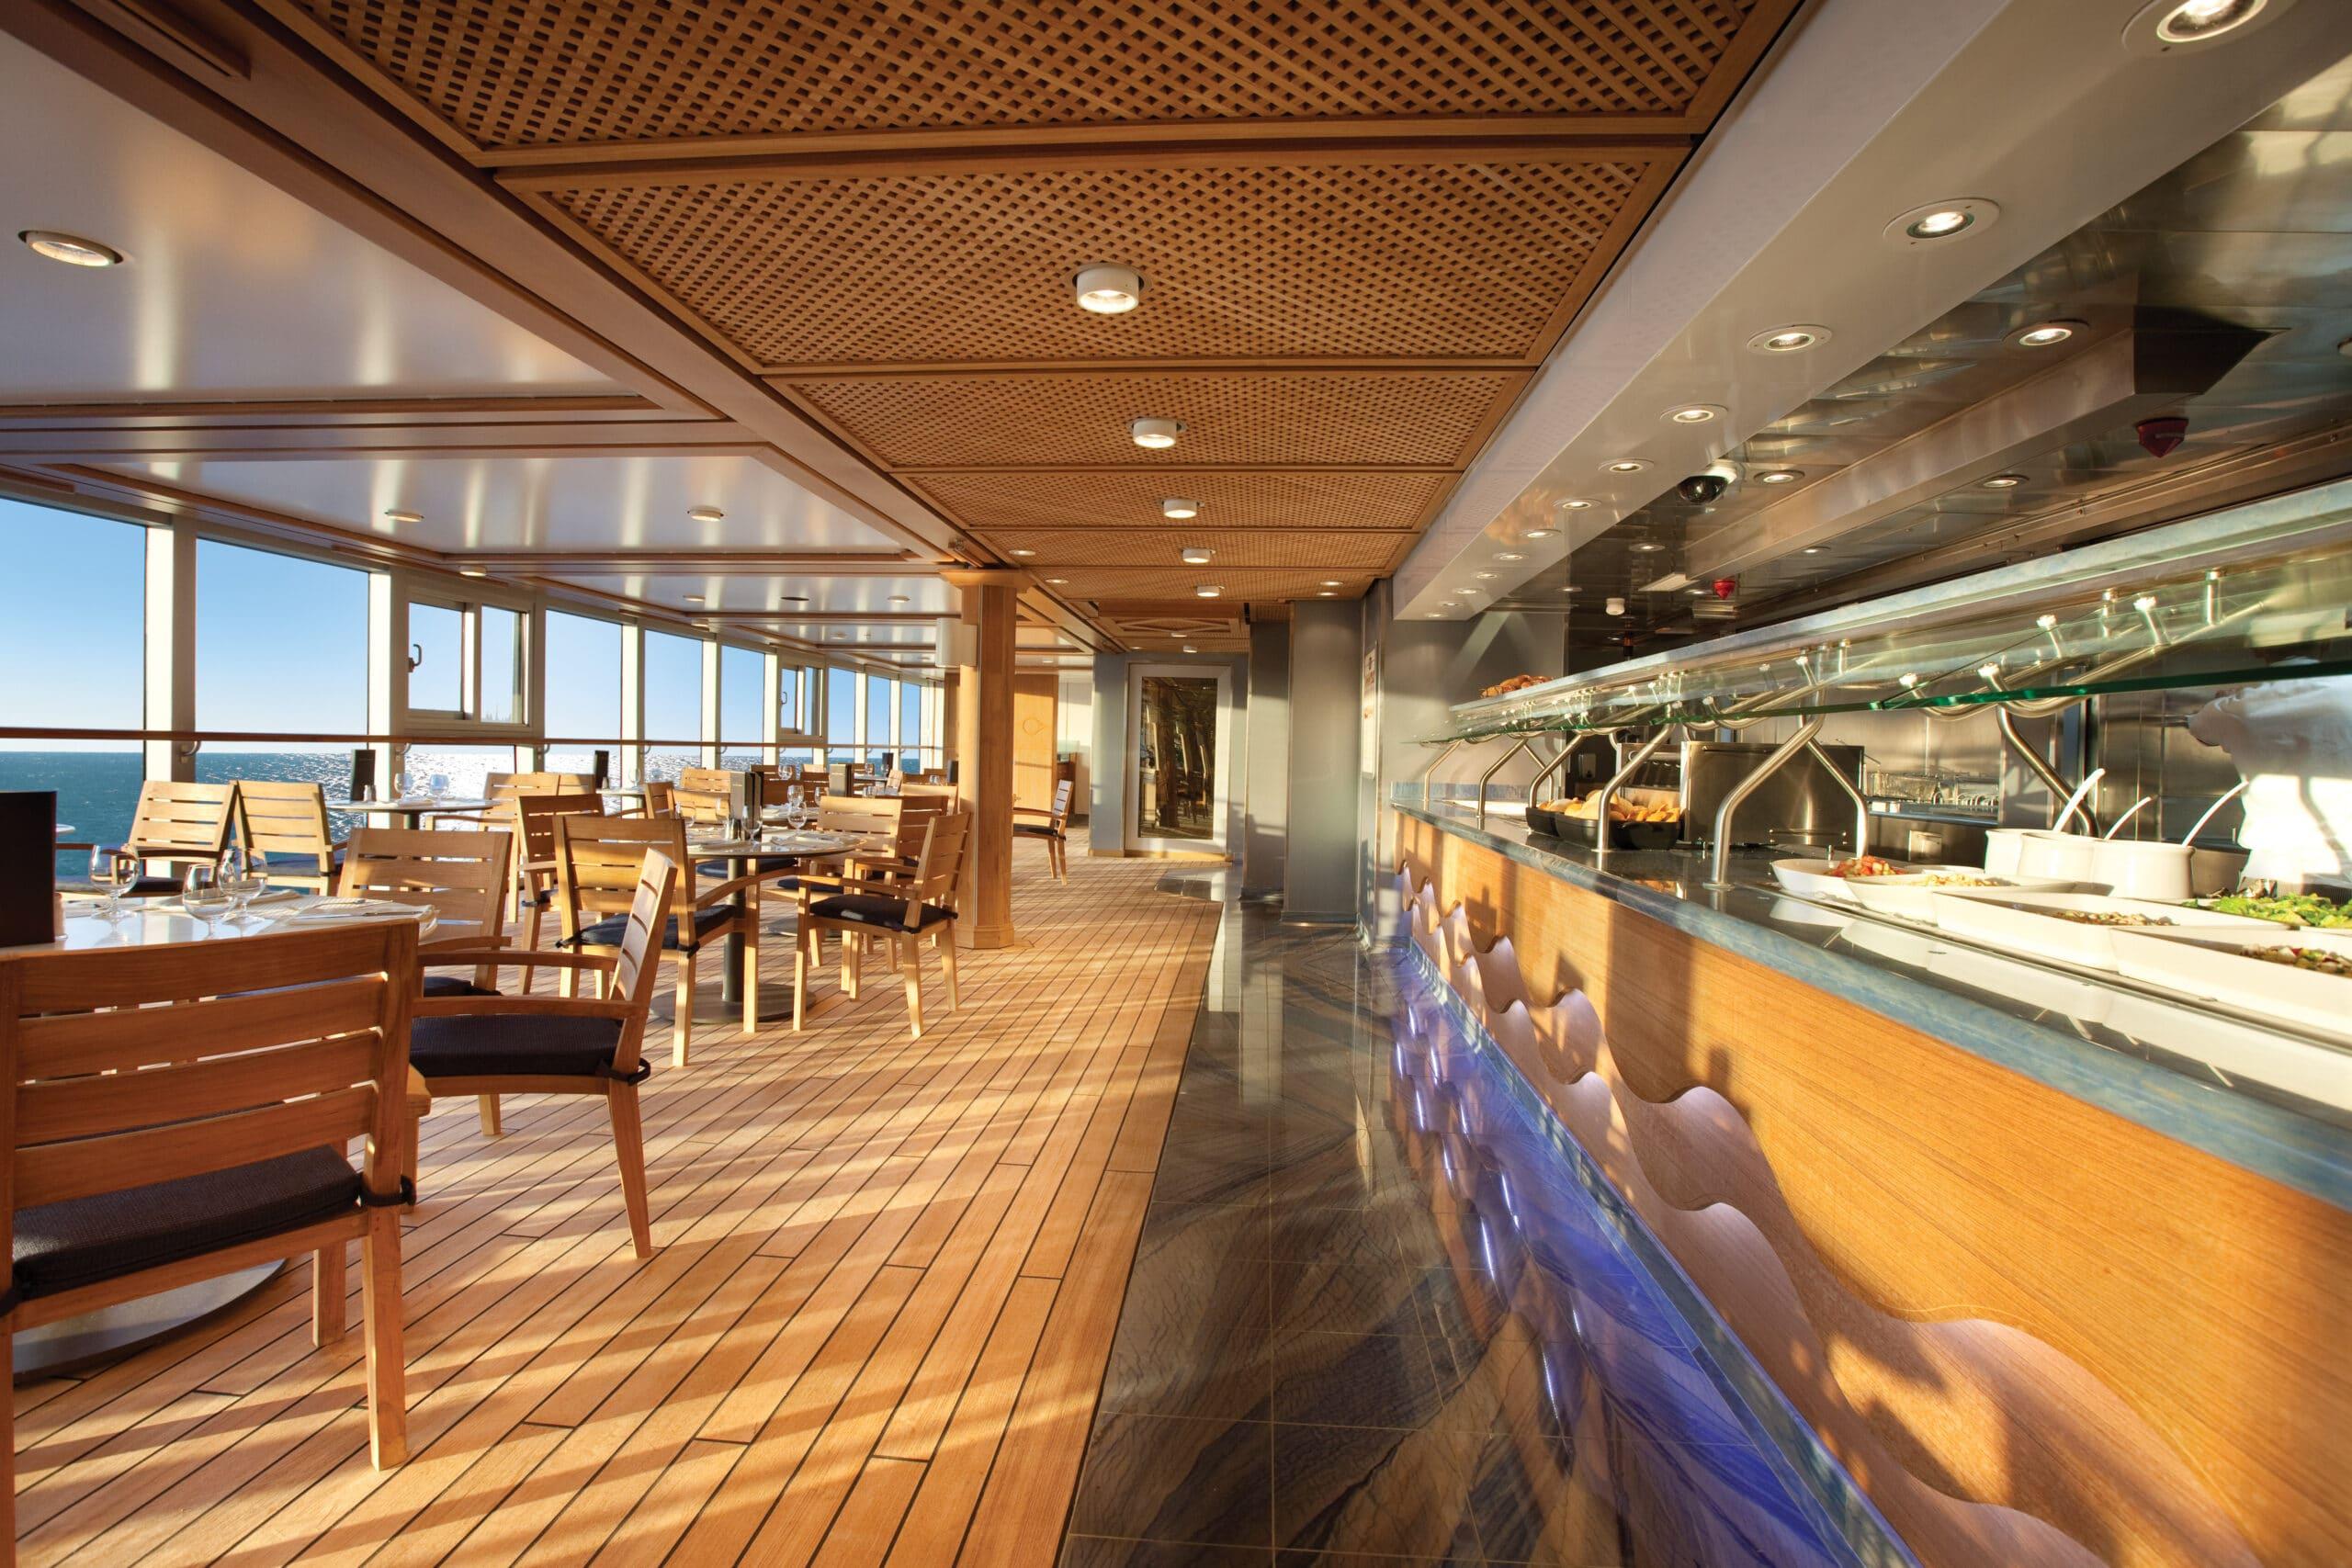 Cruiseschip-Riviera-Oceania Cruises-Restaurant Waves Grill